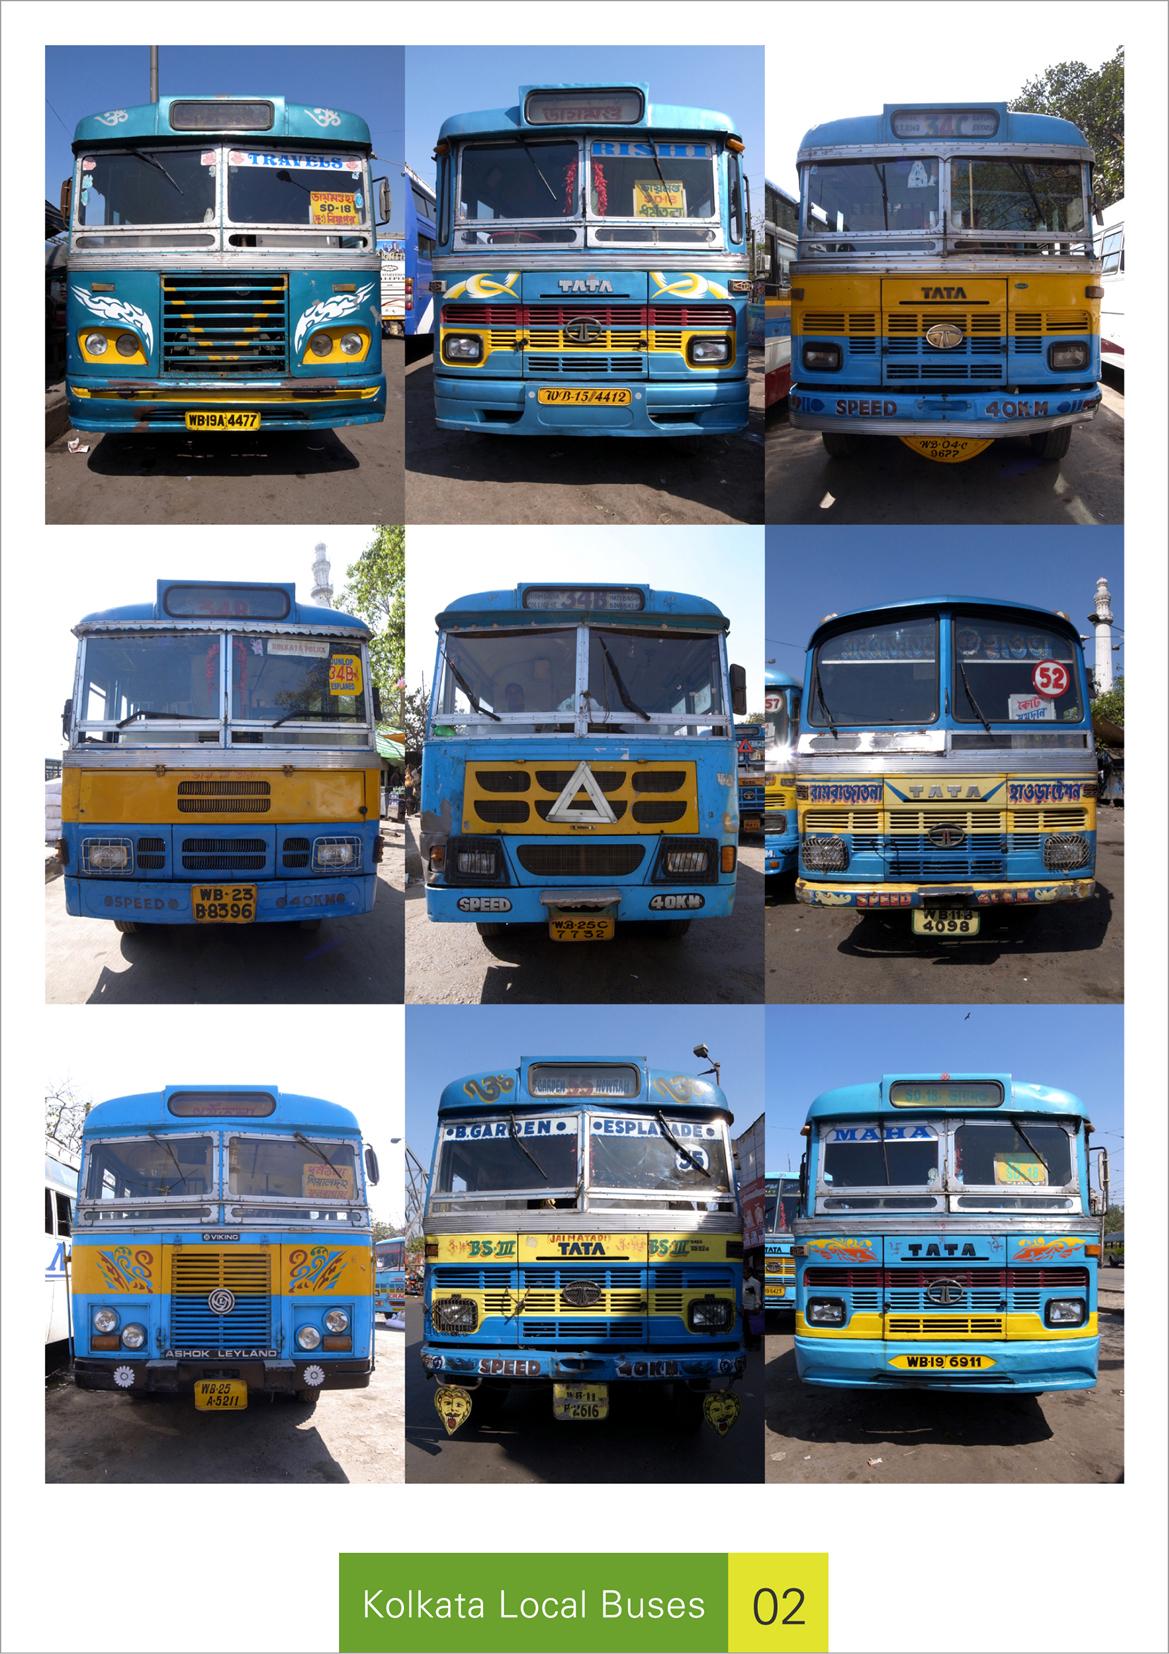 KolkataLocalBus-02.jpg